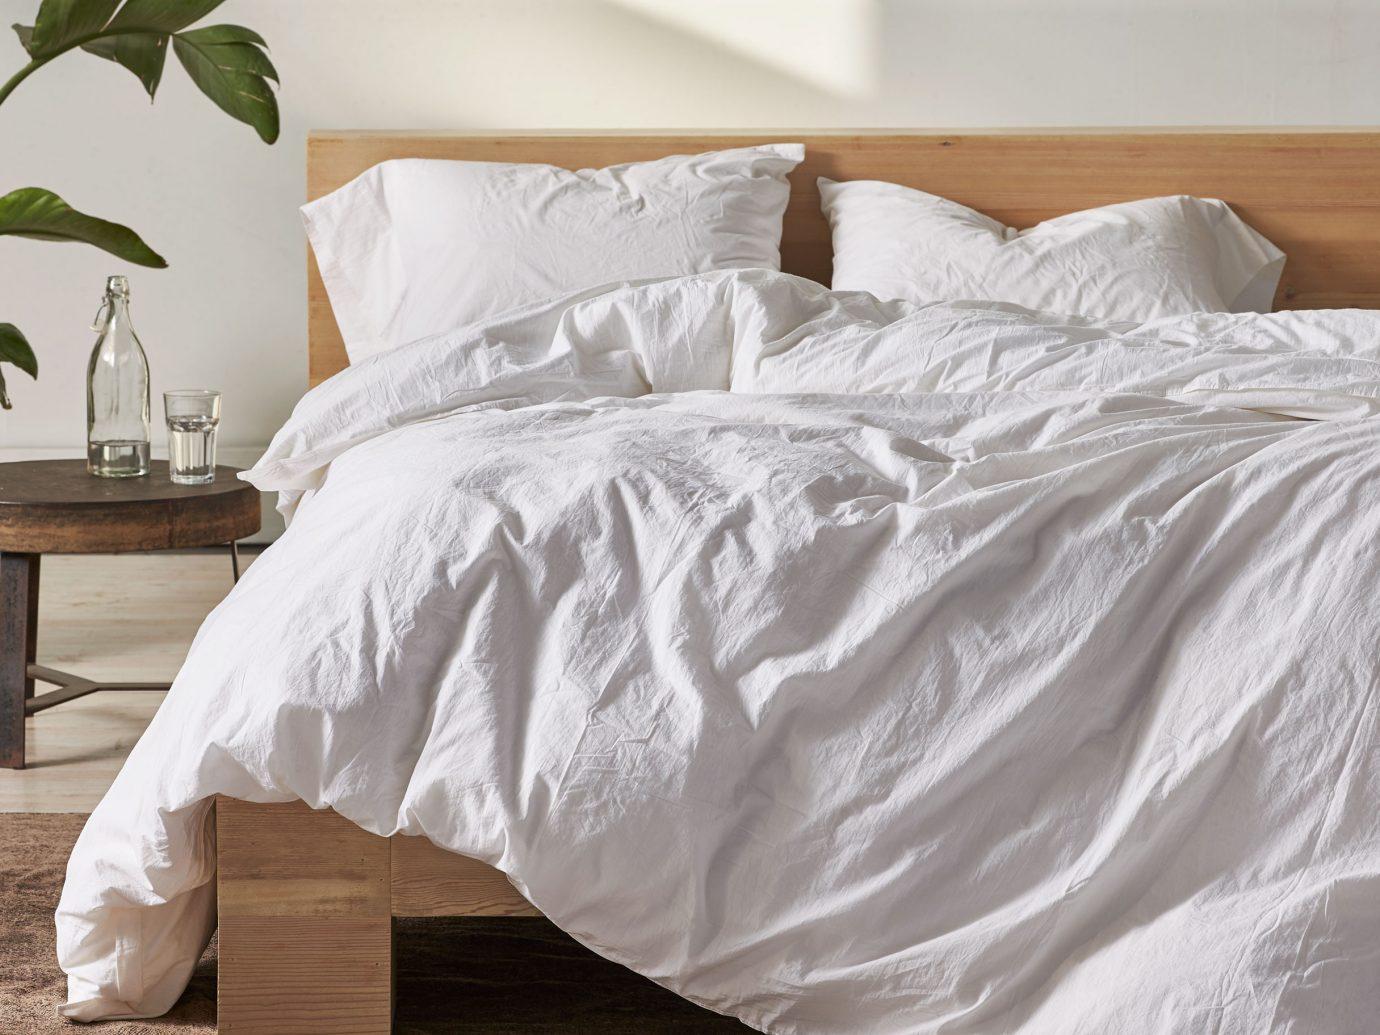 Coyuchi Organic Crinkled Percale Sheets